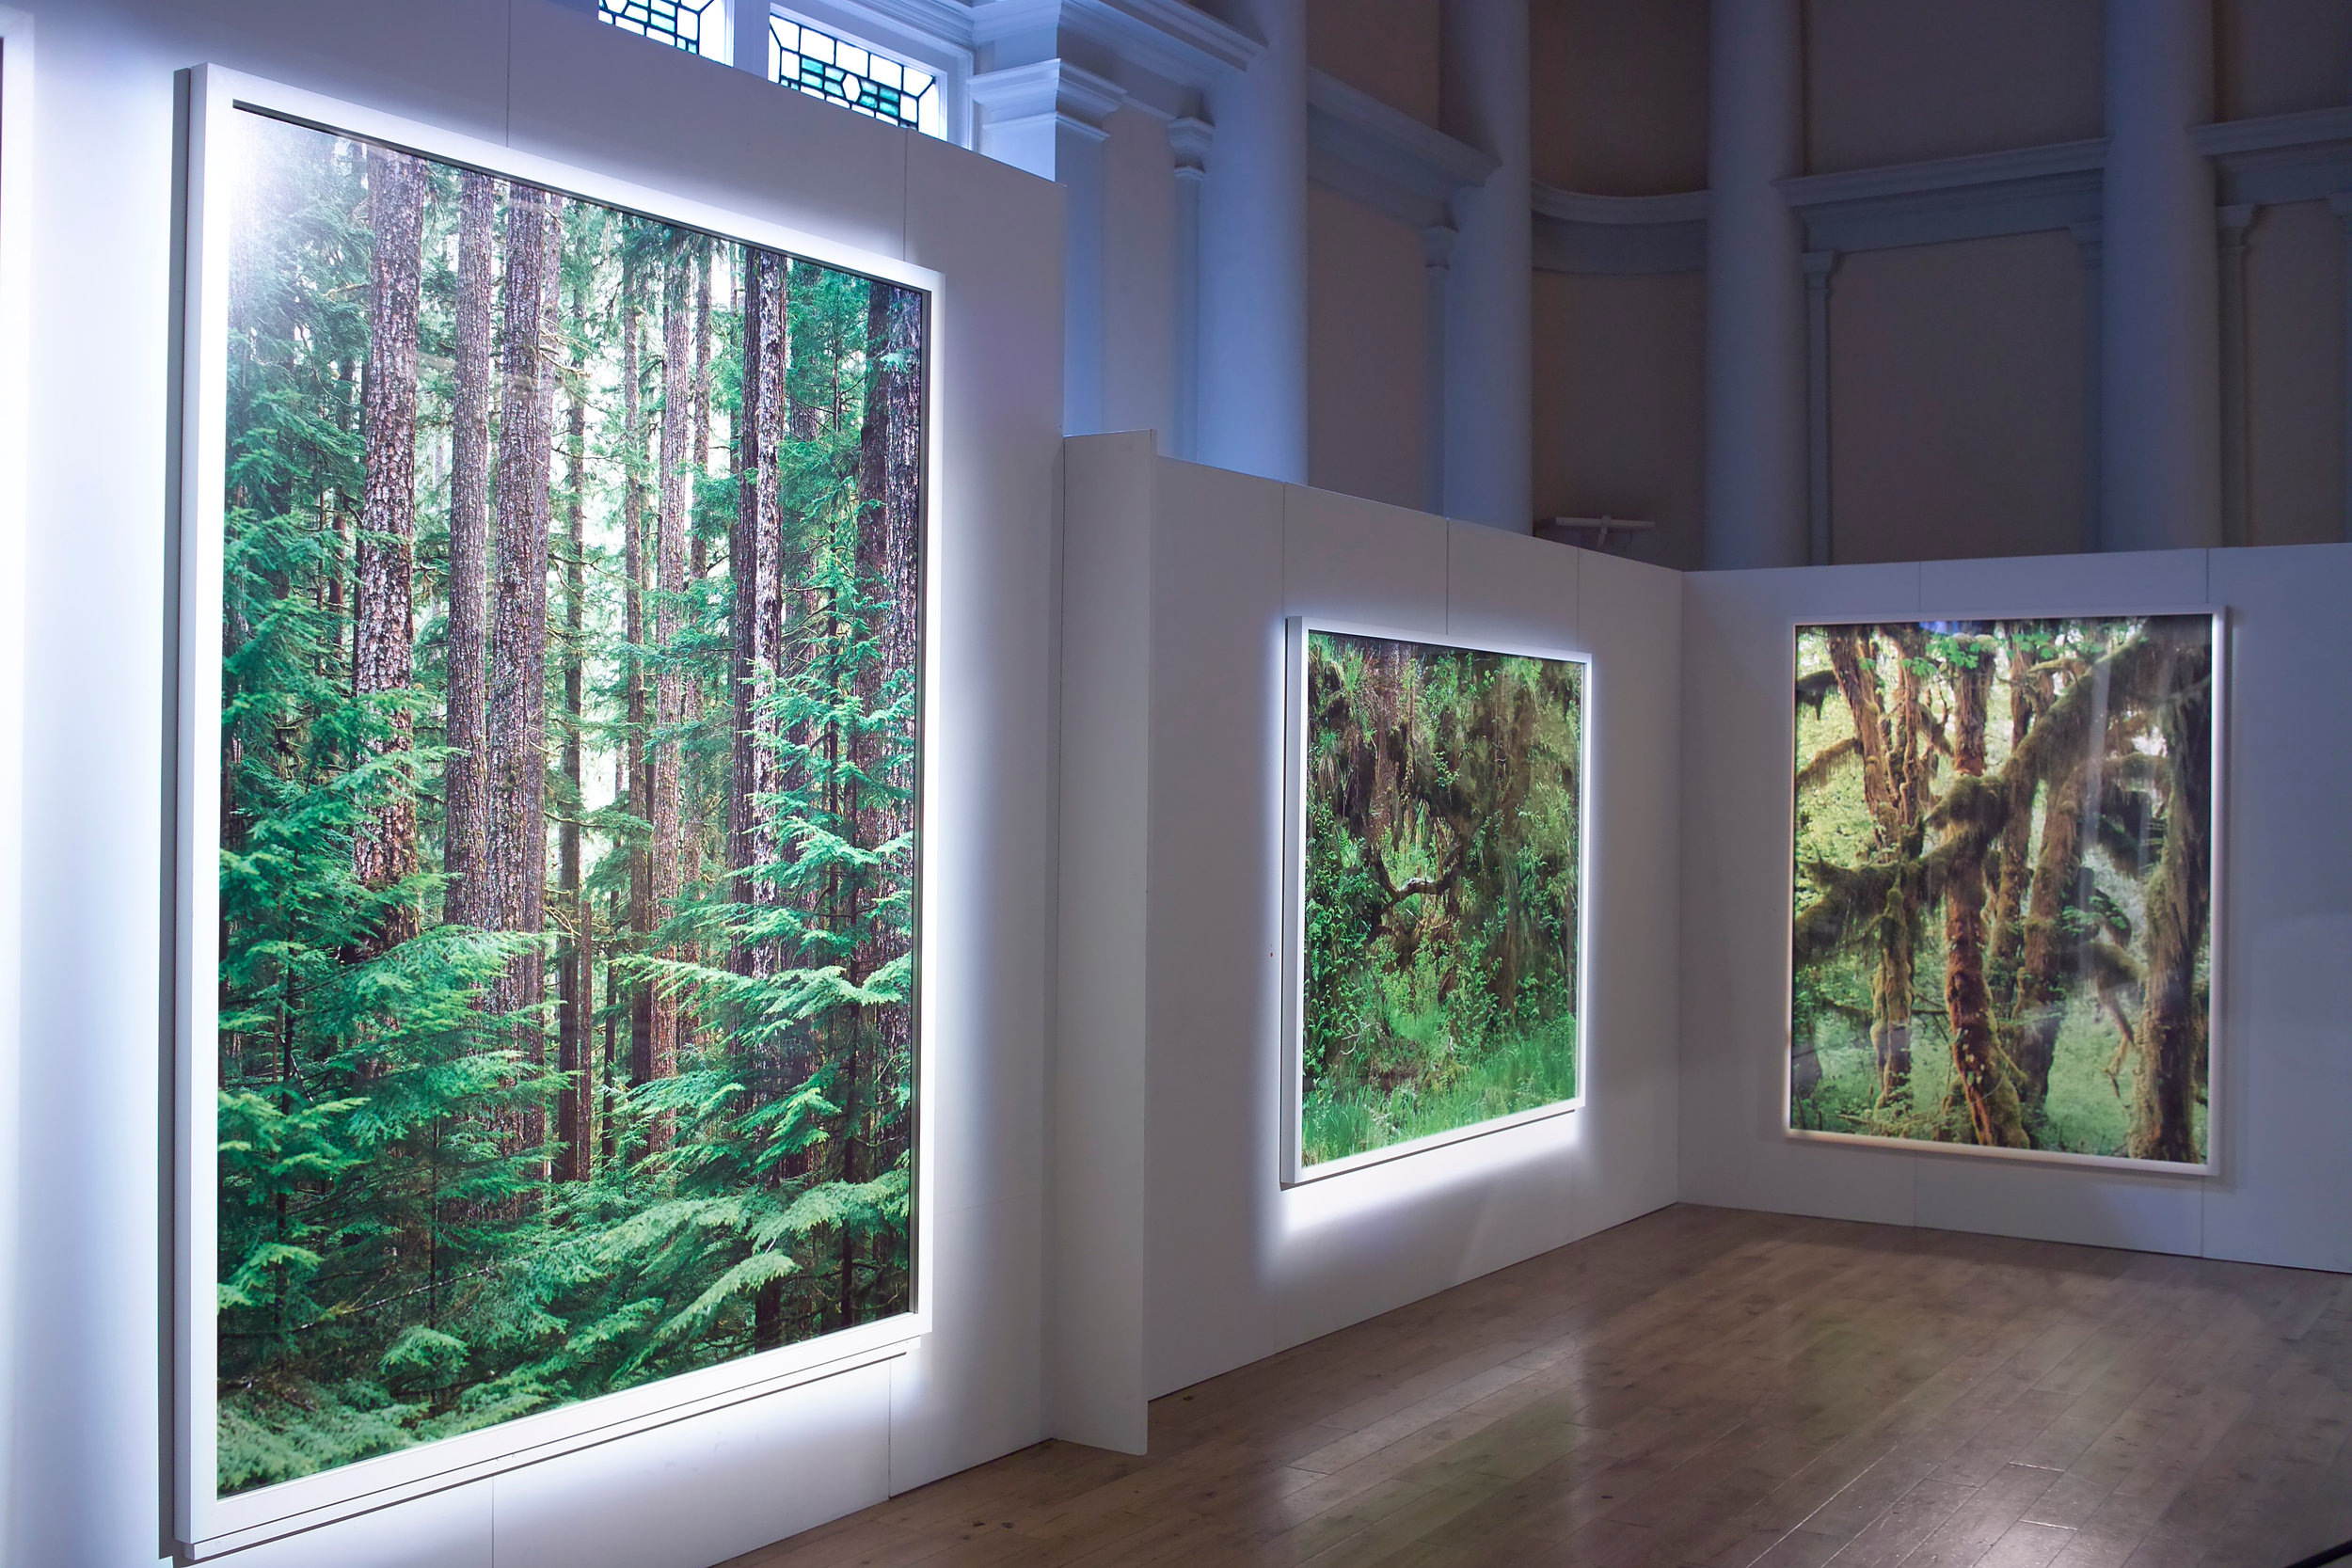 Installation View, Ithaka, 2008, Shoreditch Town Hall, London